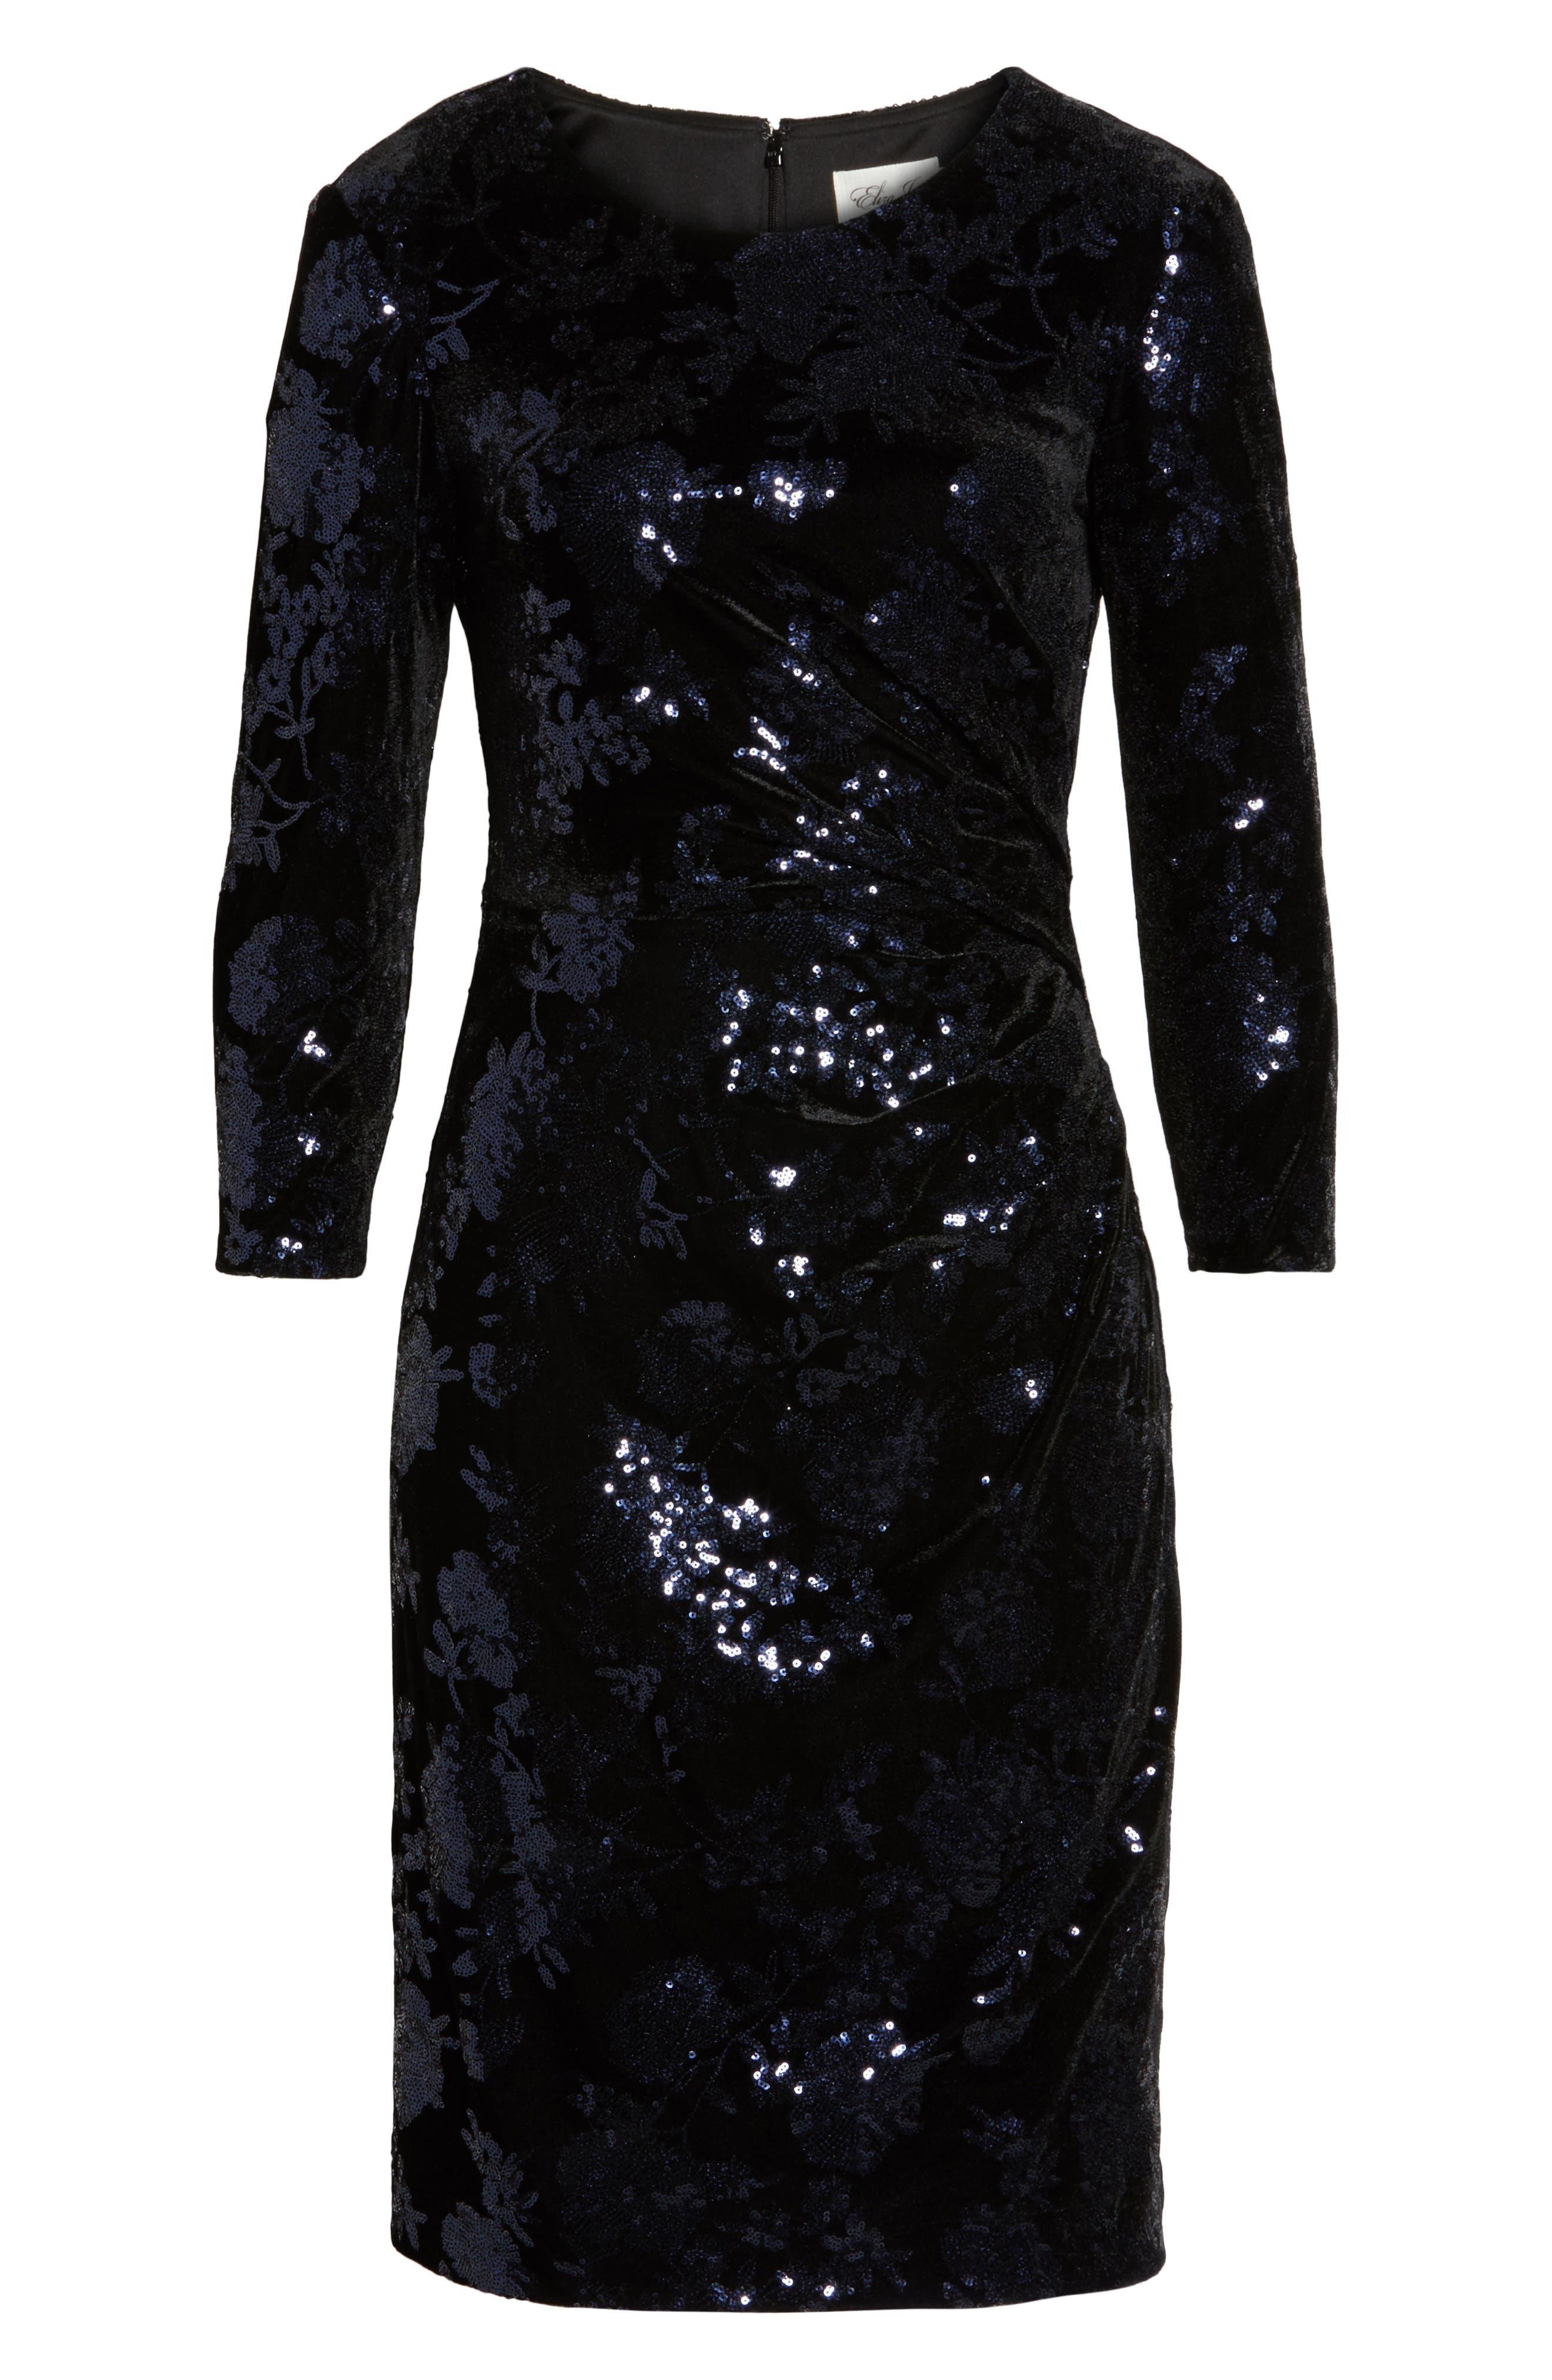 Sequin Embellished Sheath Dress,                             Alternate thumbnail 6, color,                             001